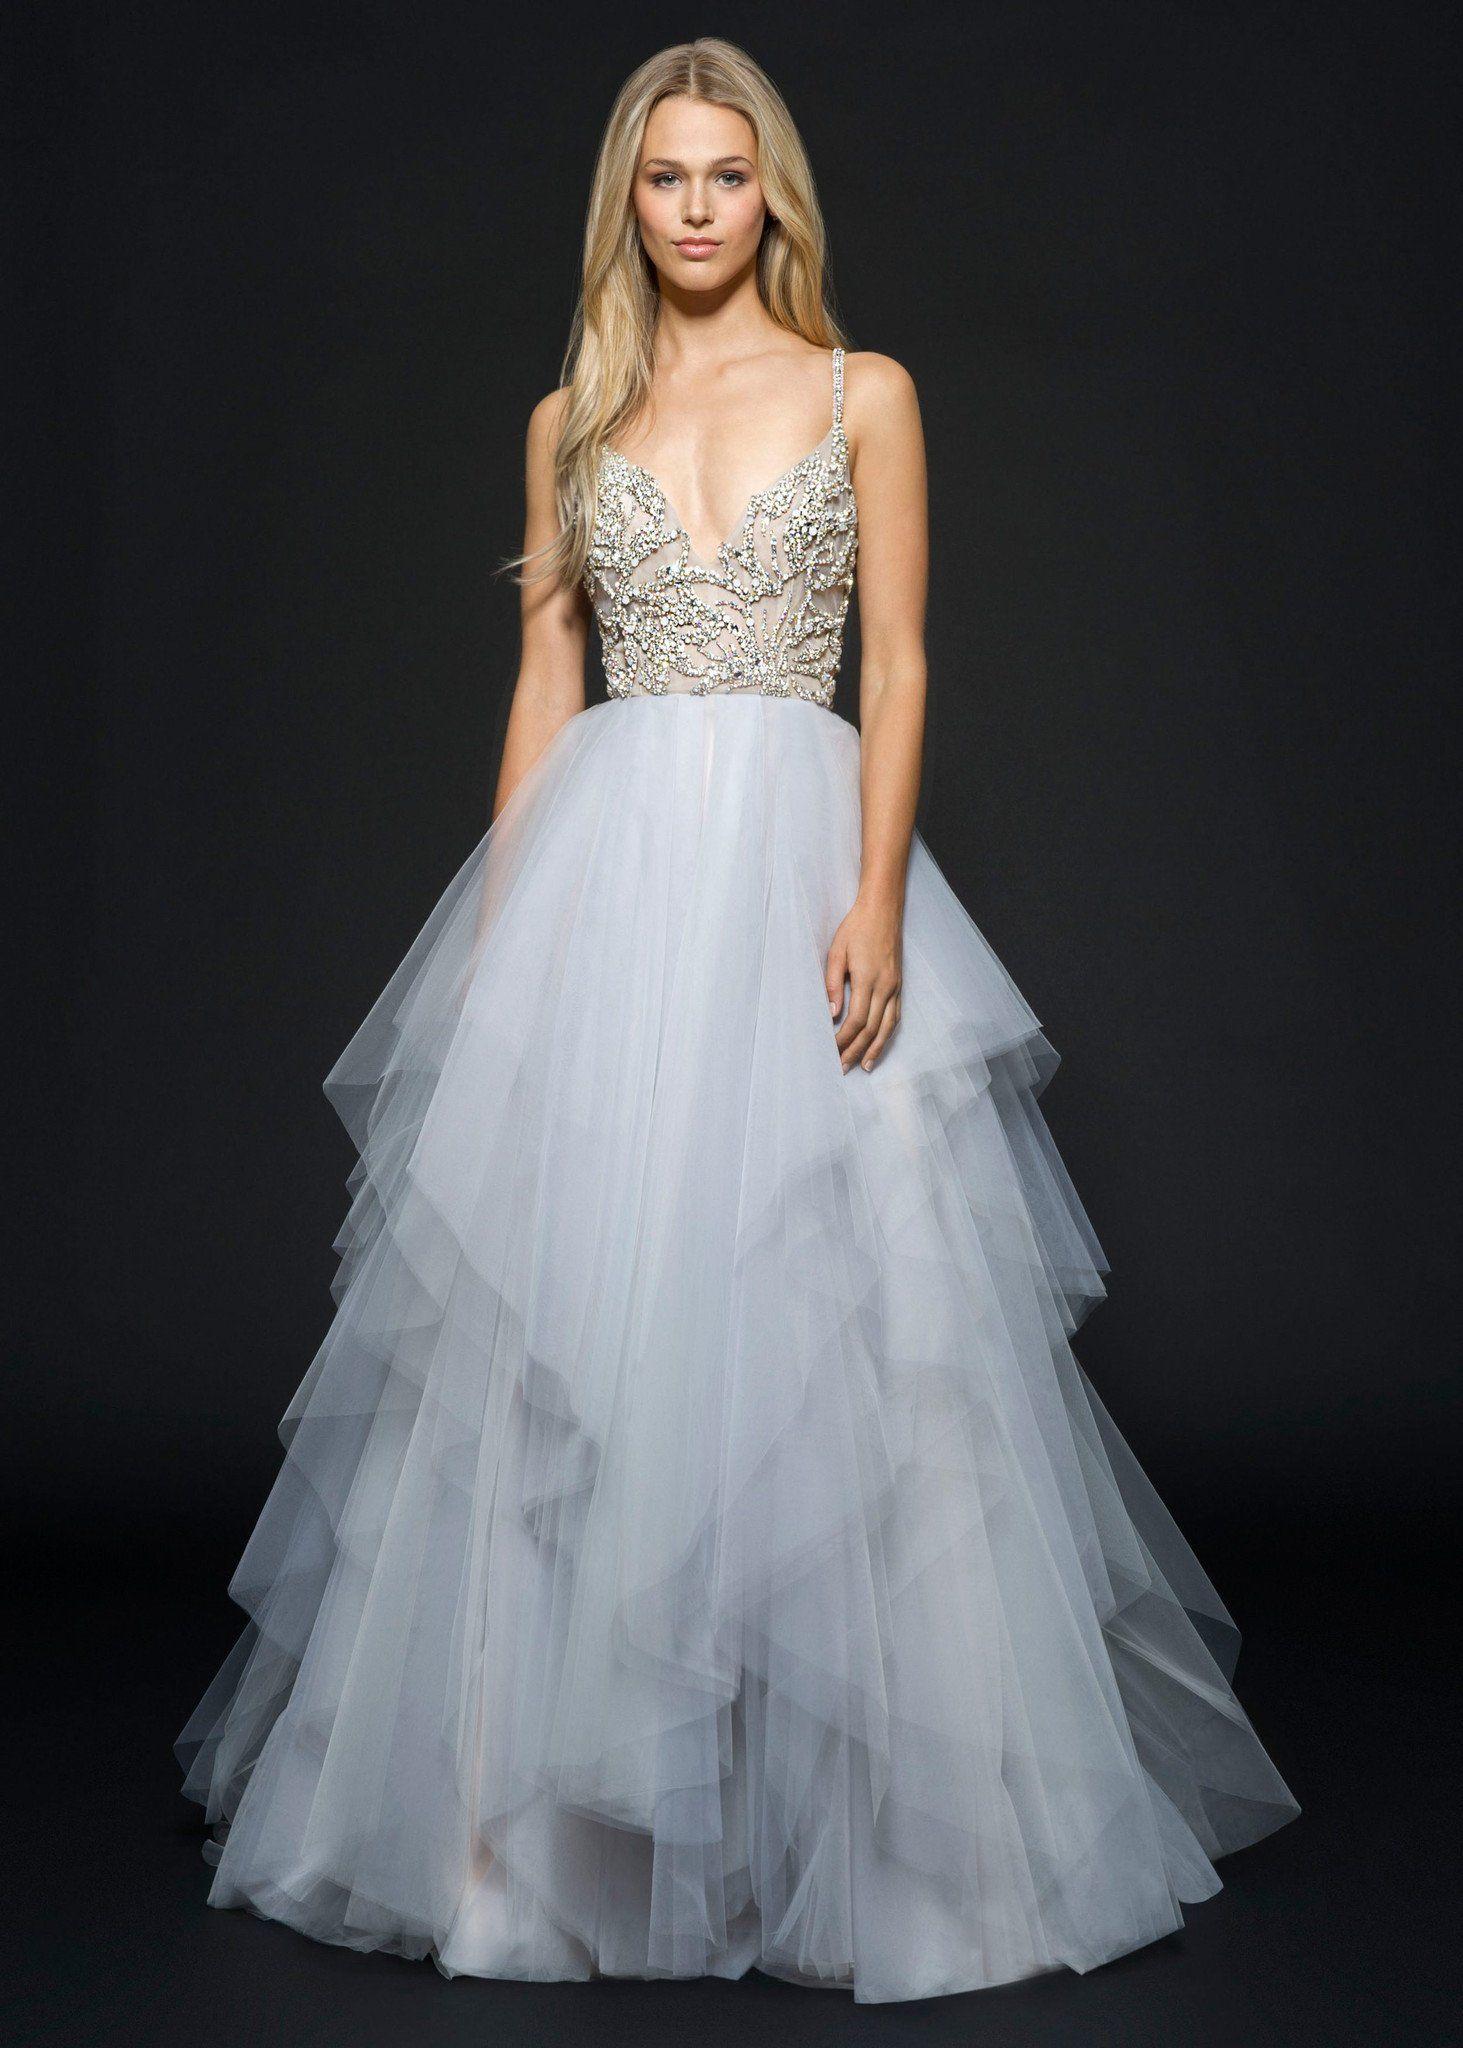 Rhinestone wedding dresses   Arlo in   Wedding Ideas  Pinterest  Tulle skirts